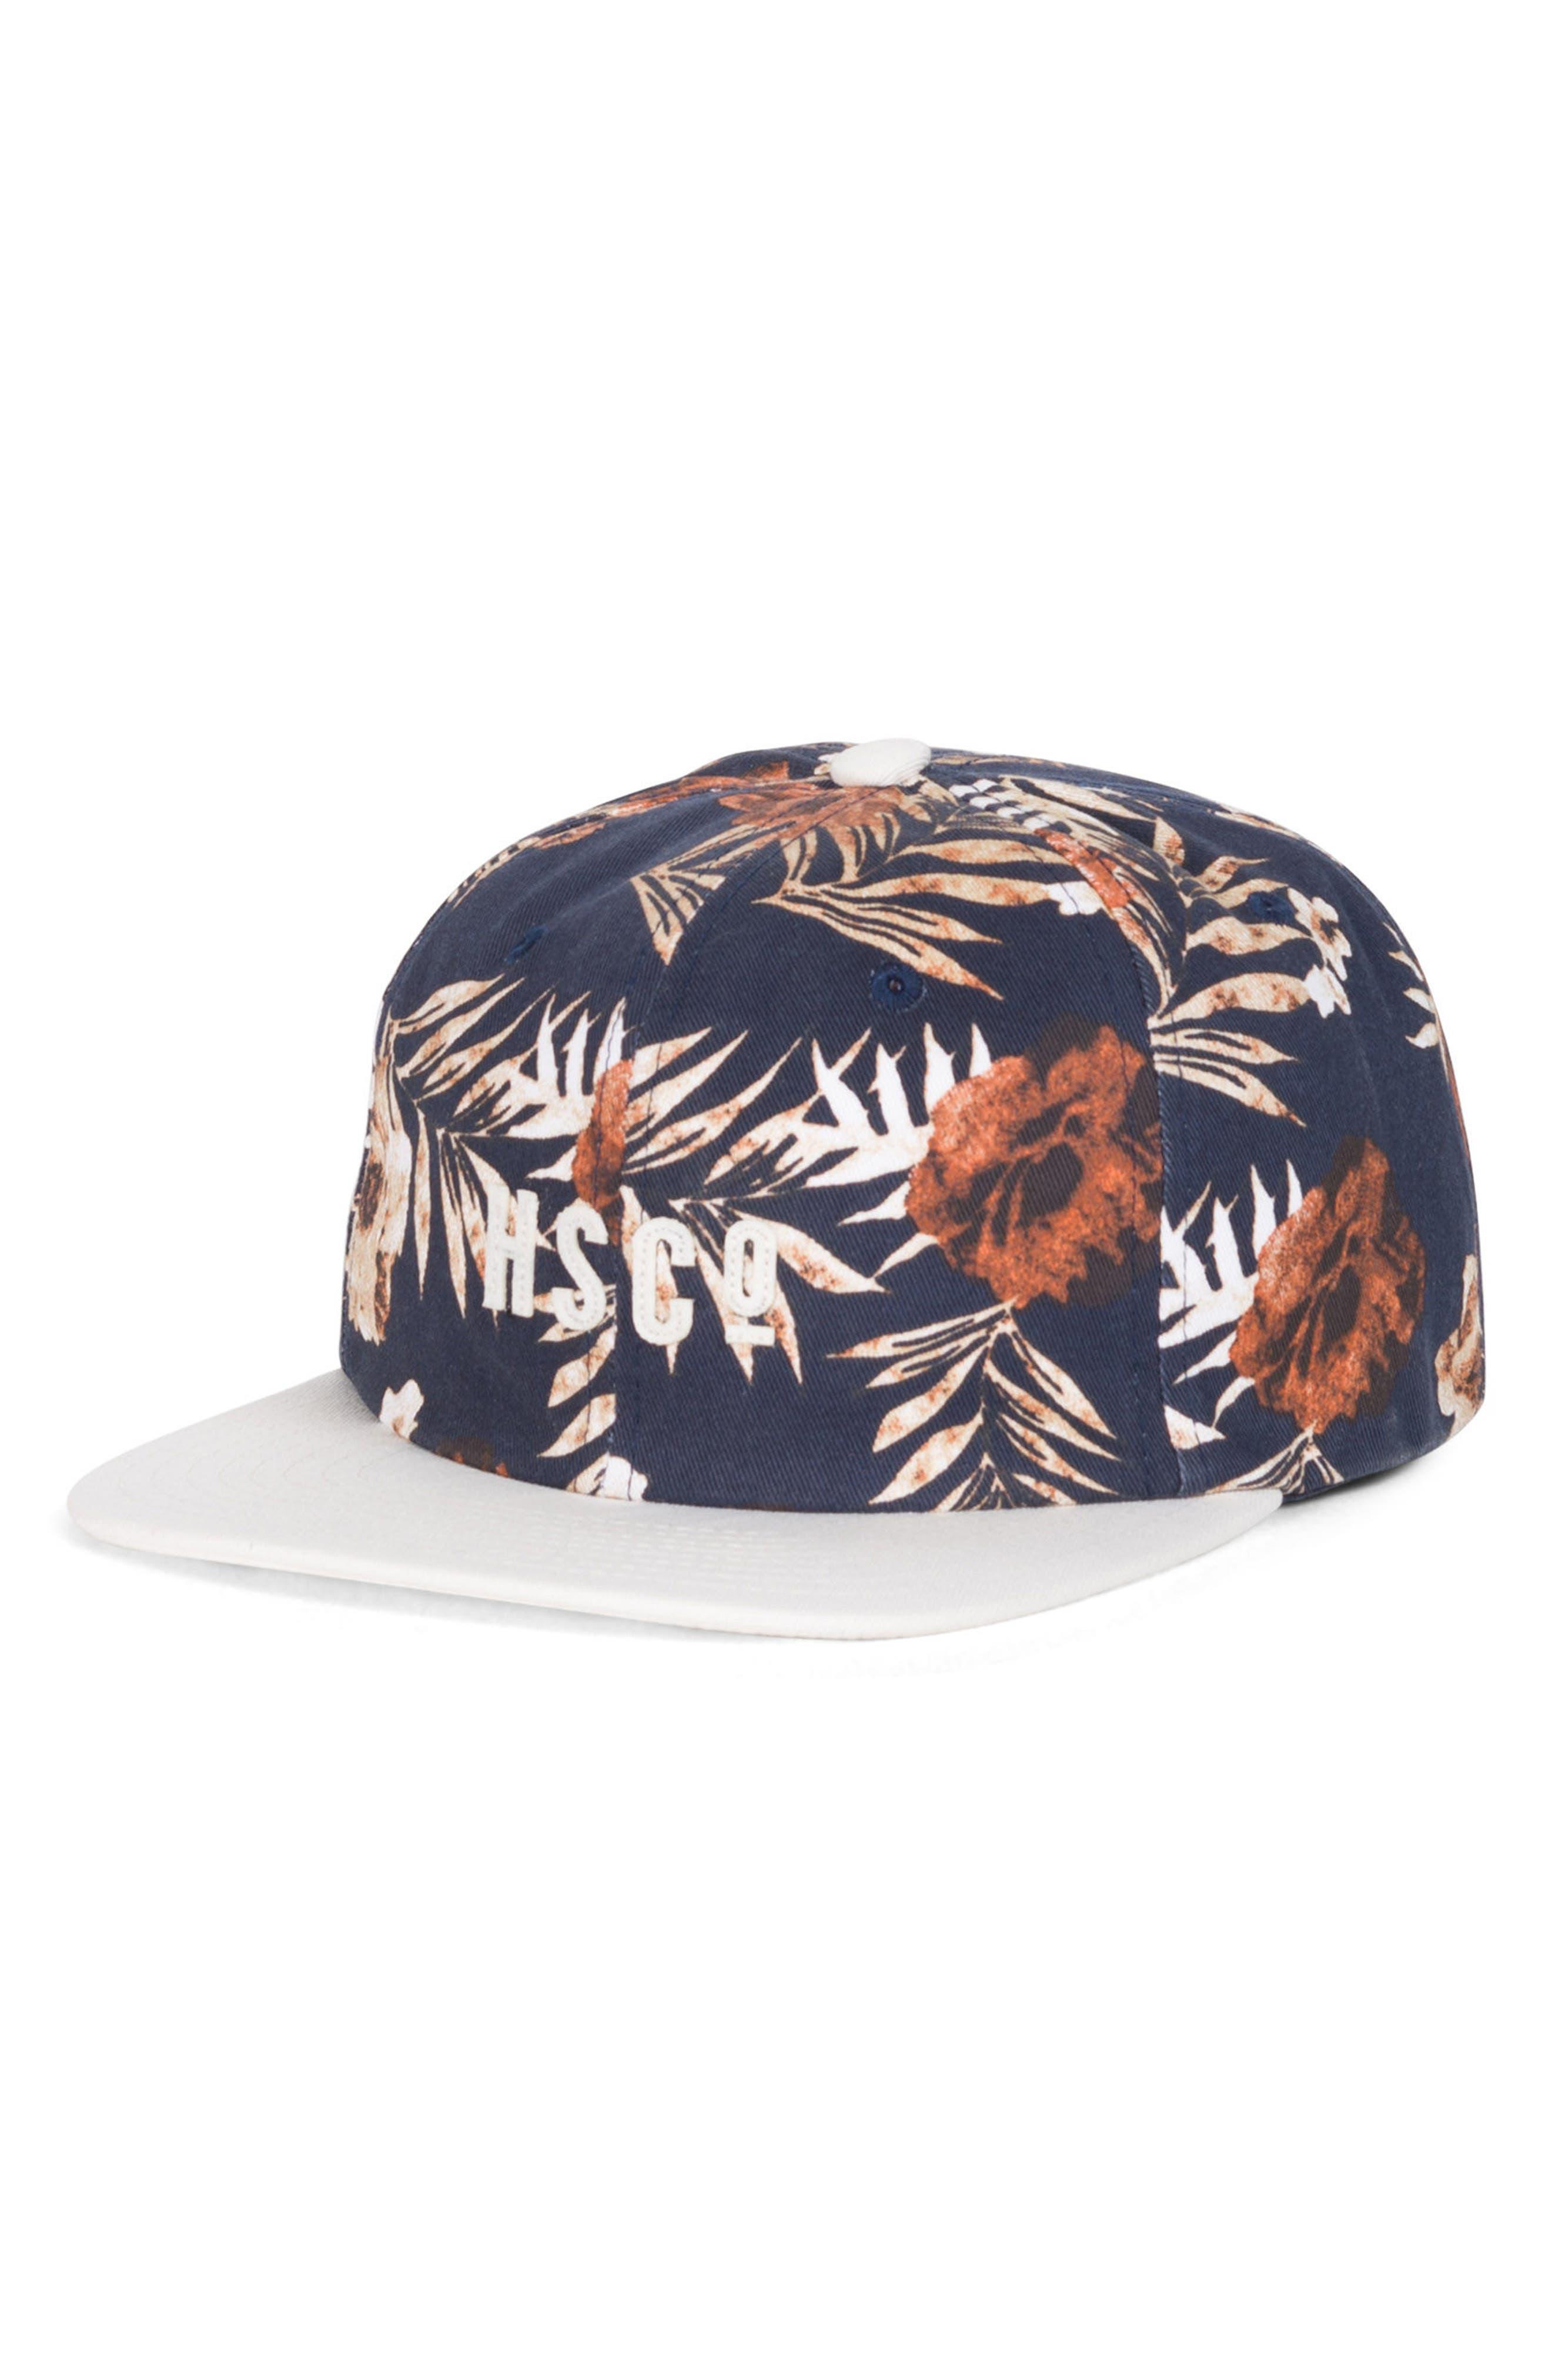 Mosby Snapback Baseball Cap,                         Main,                         color, 252